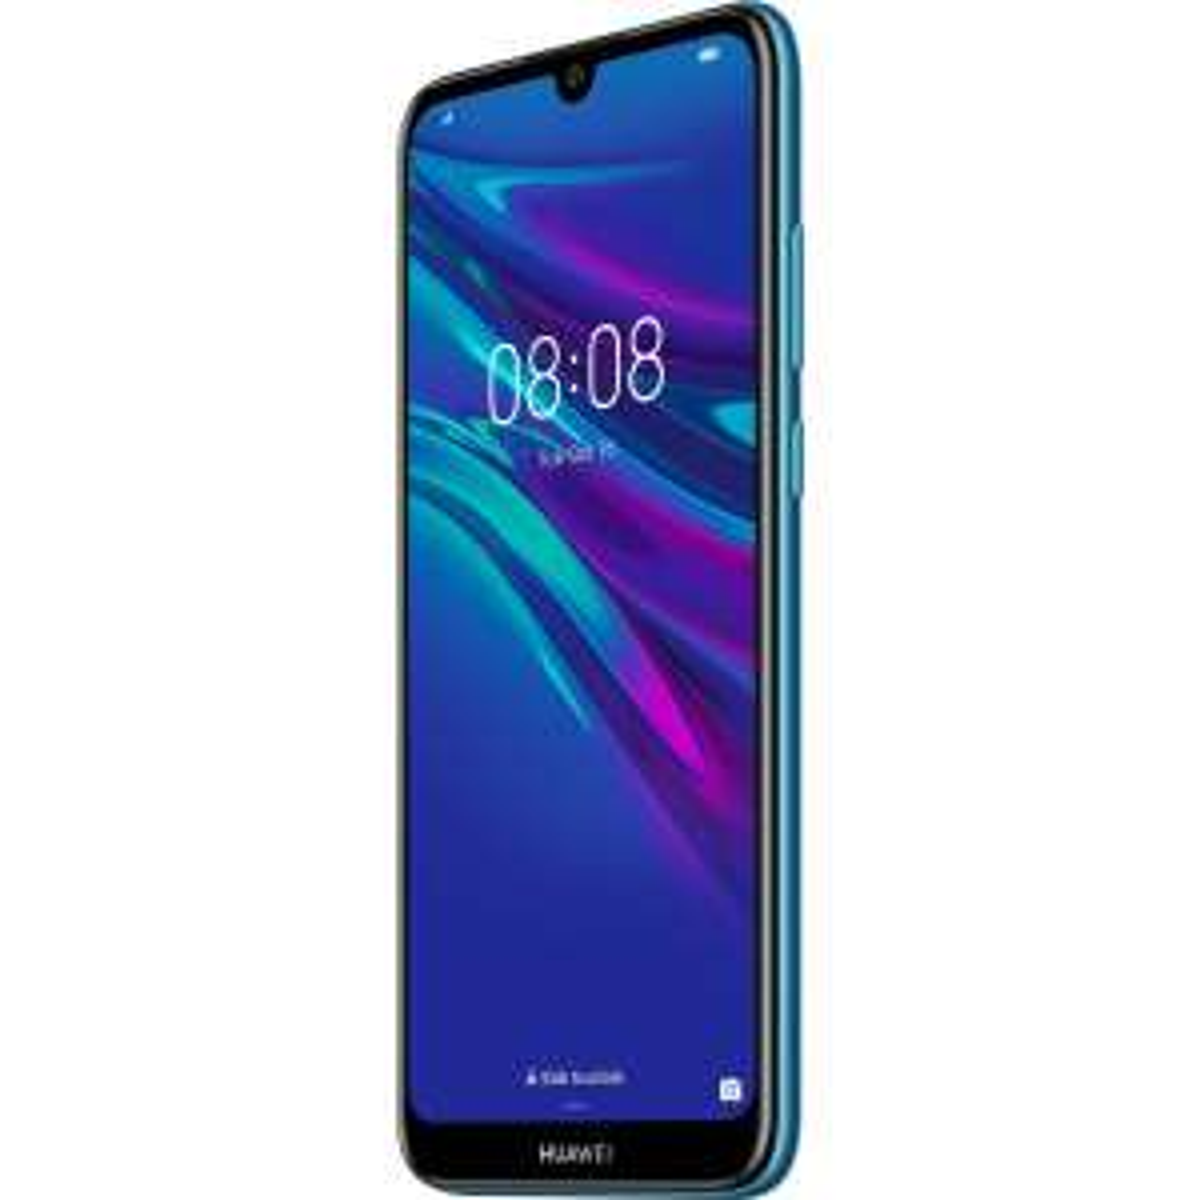 "Smartphone 6.09"" Huawei Y6 2019 Bleu - HD+, MT6761, RAM 2 Go, 32 Go (Via ODR de 30€)"